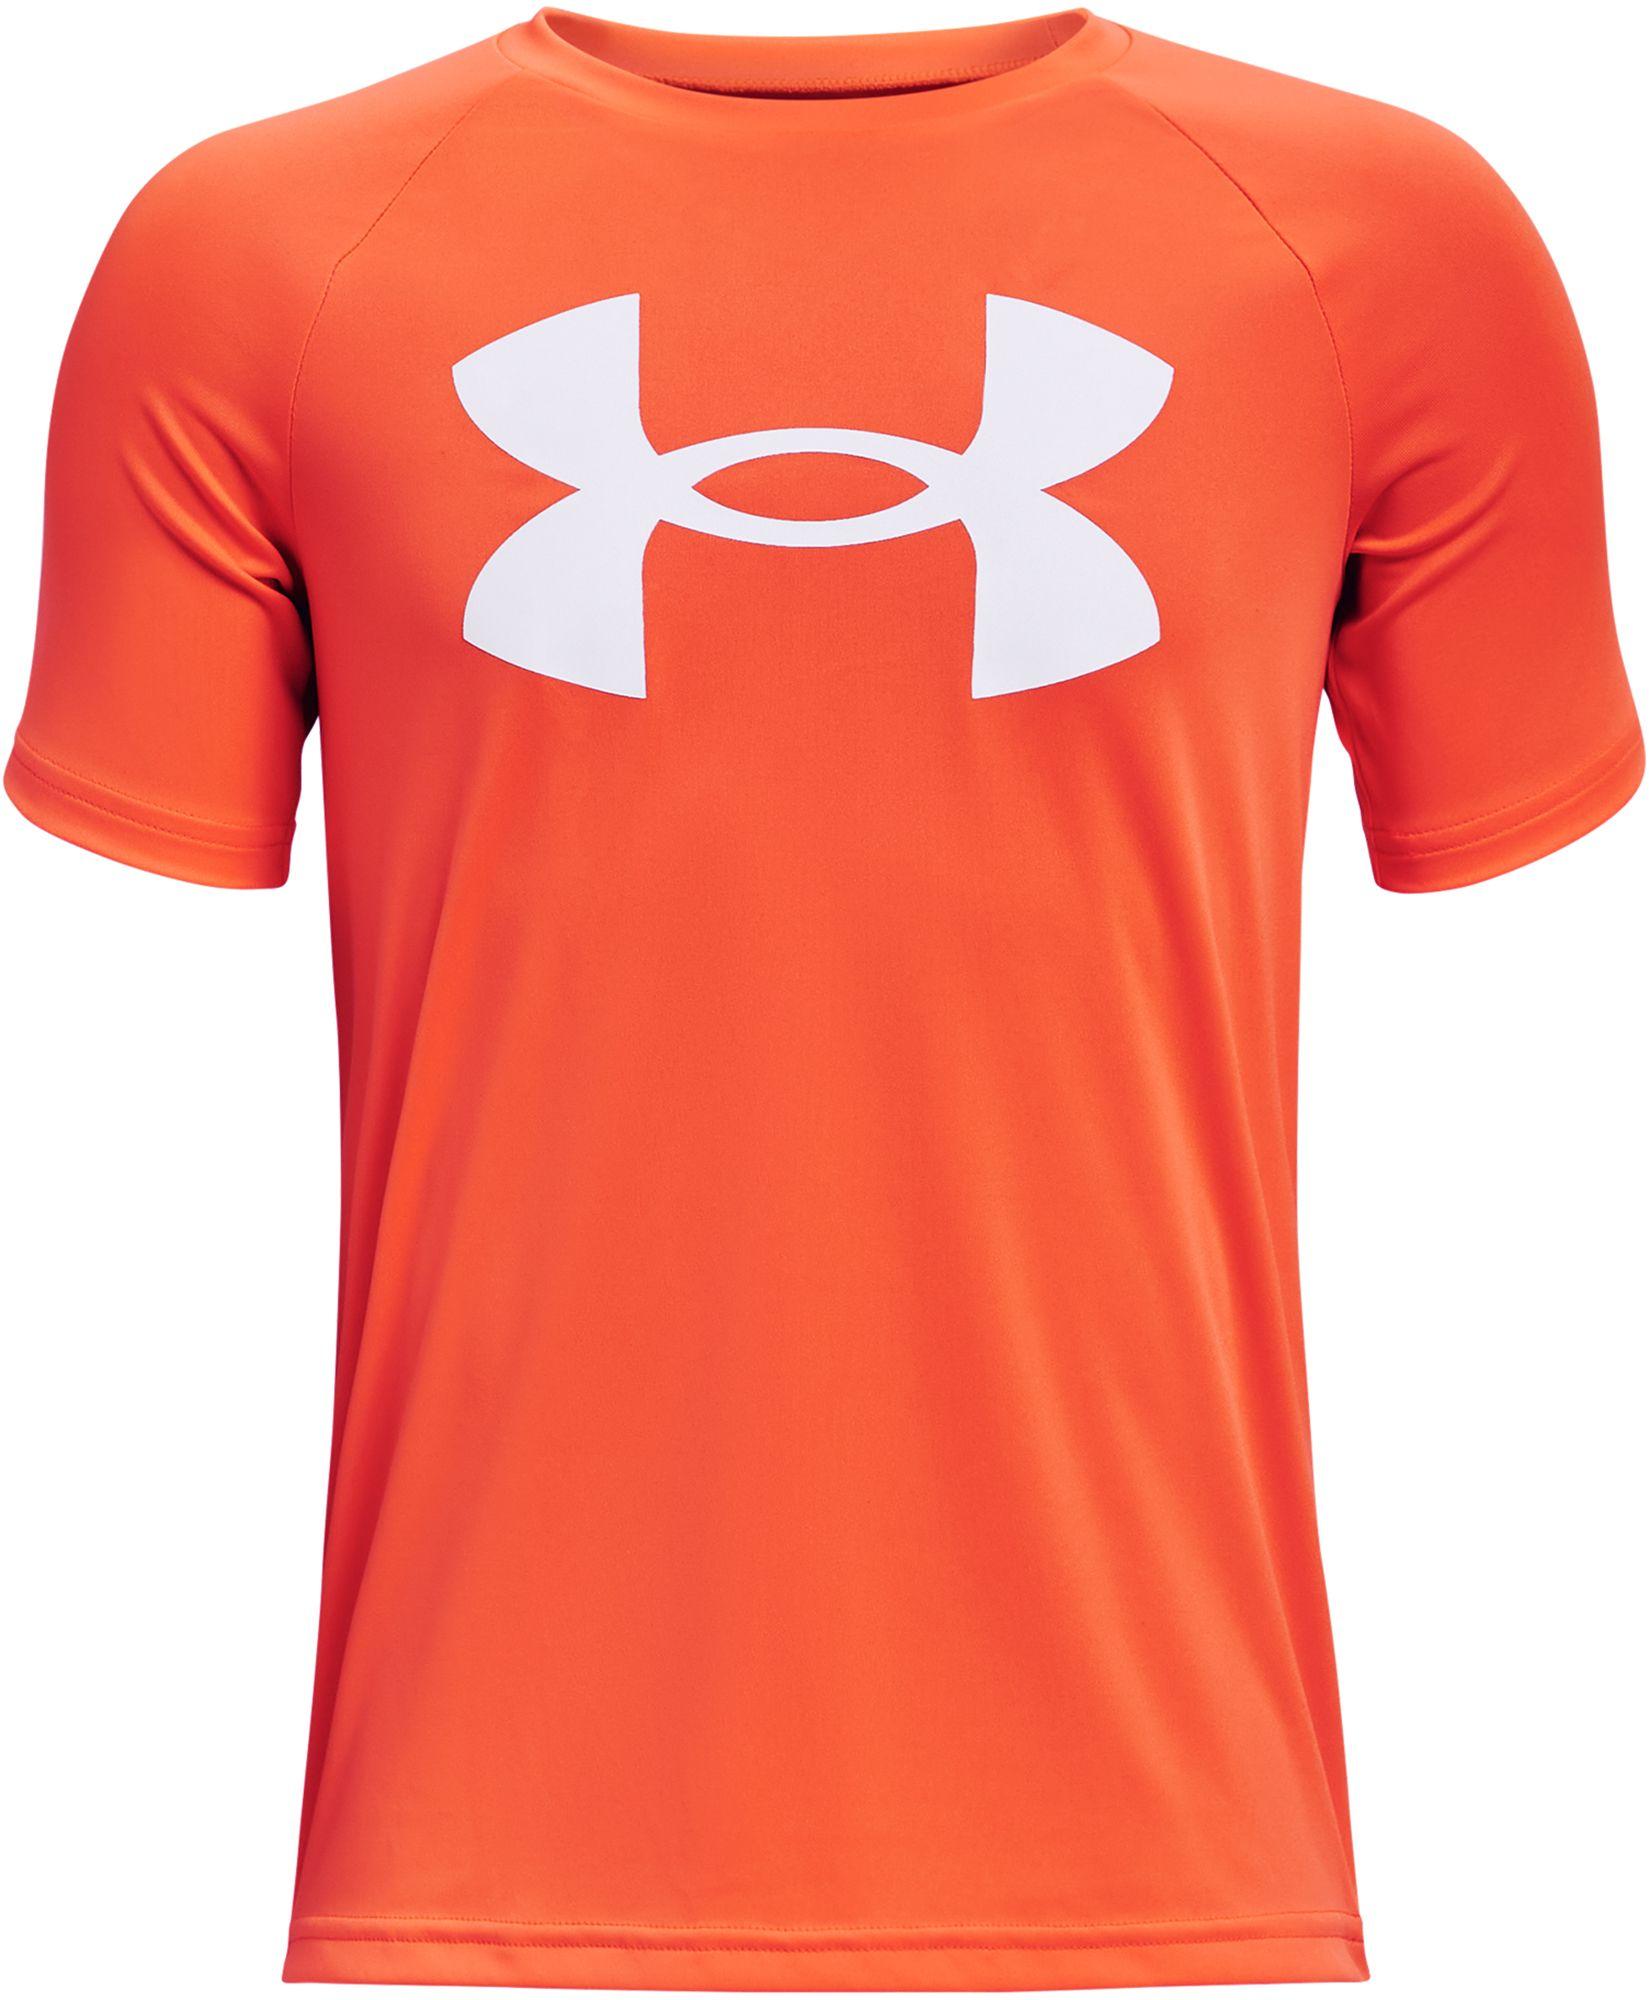 Under Armour Boys' Tech Big Logo T-Shirt, XS, Blaze Orange